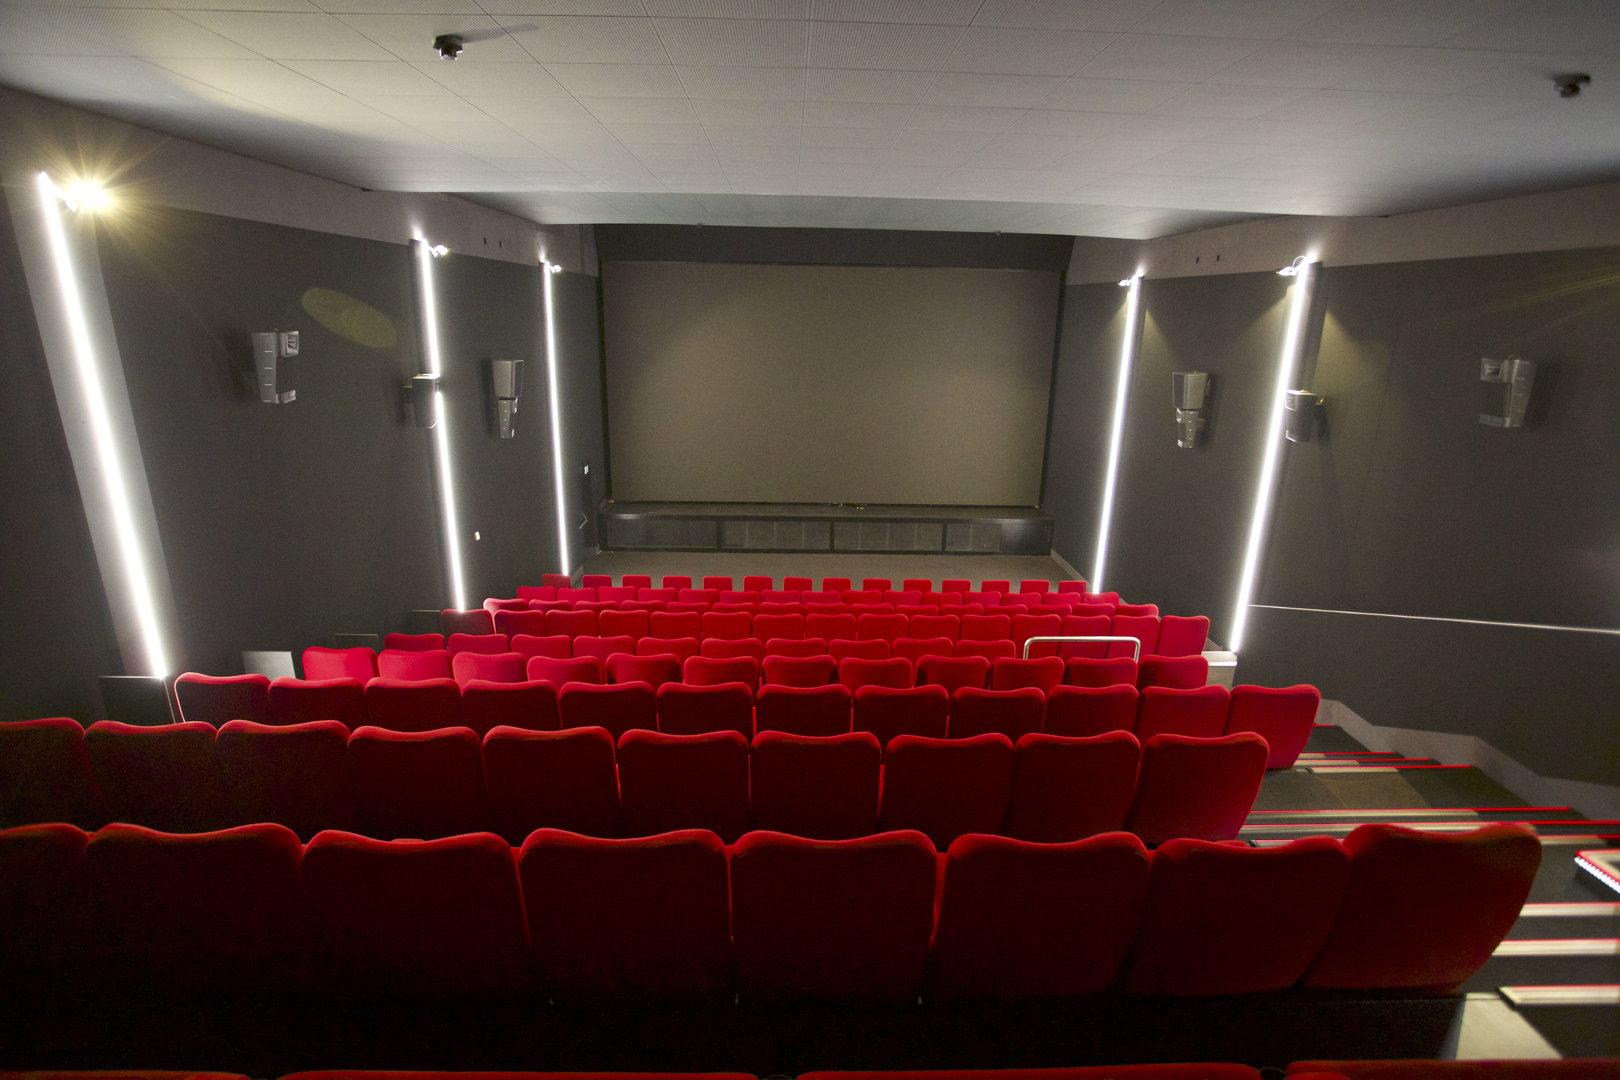 Arena Cinemas Zürich Sihlcity Saal 5